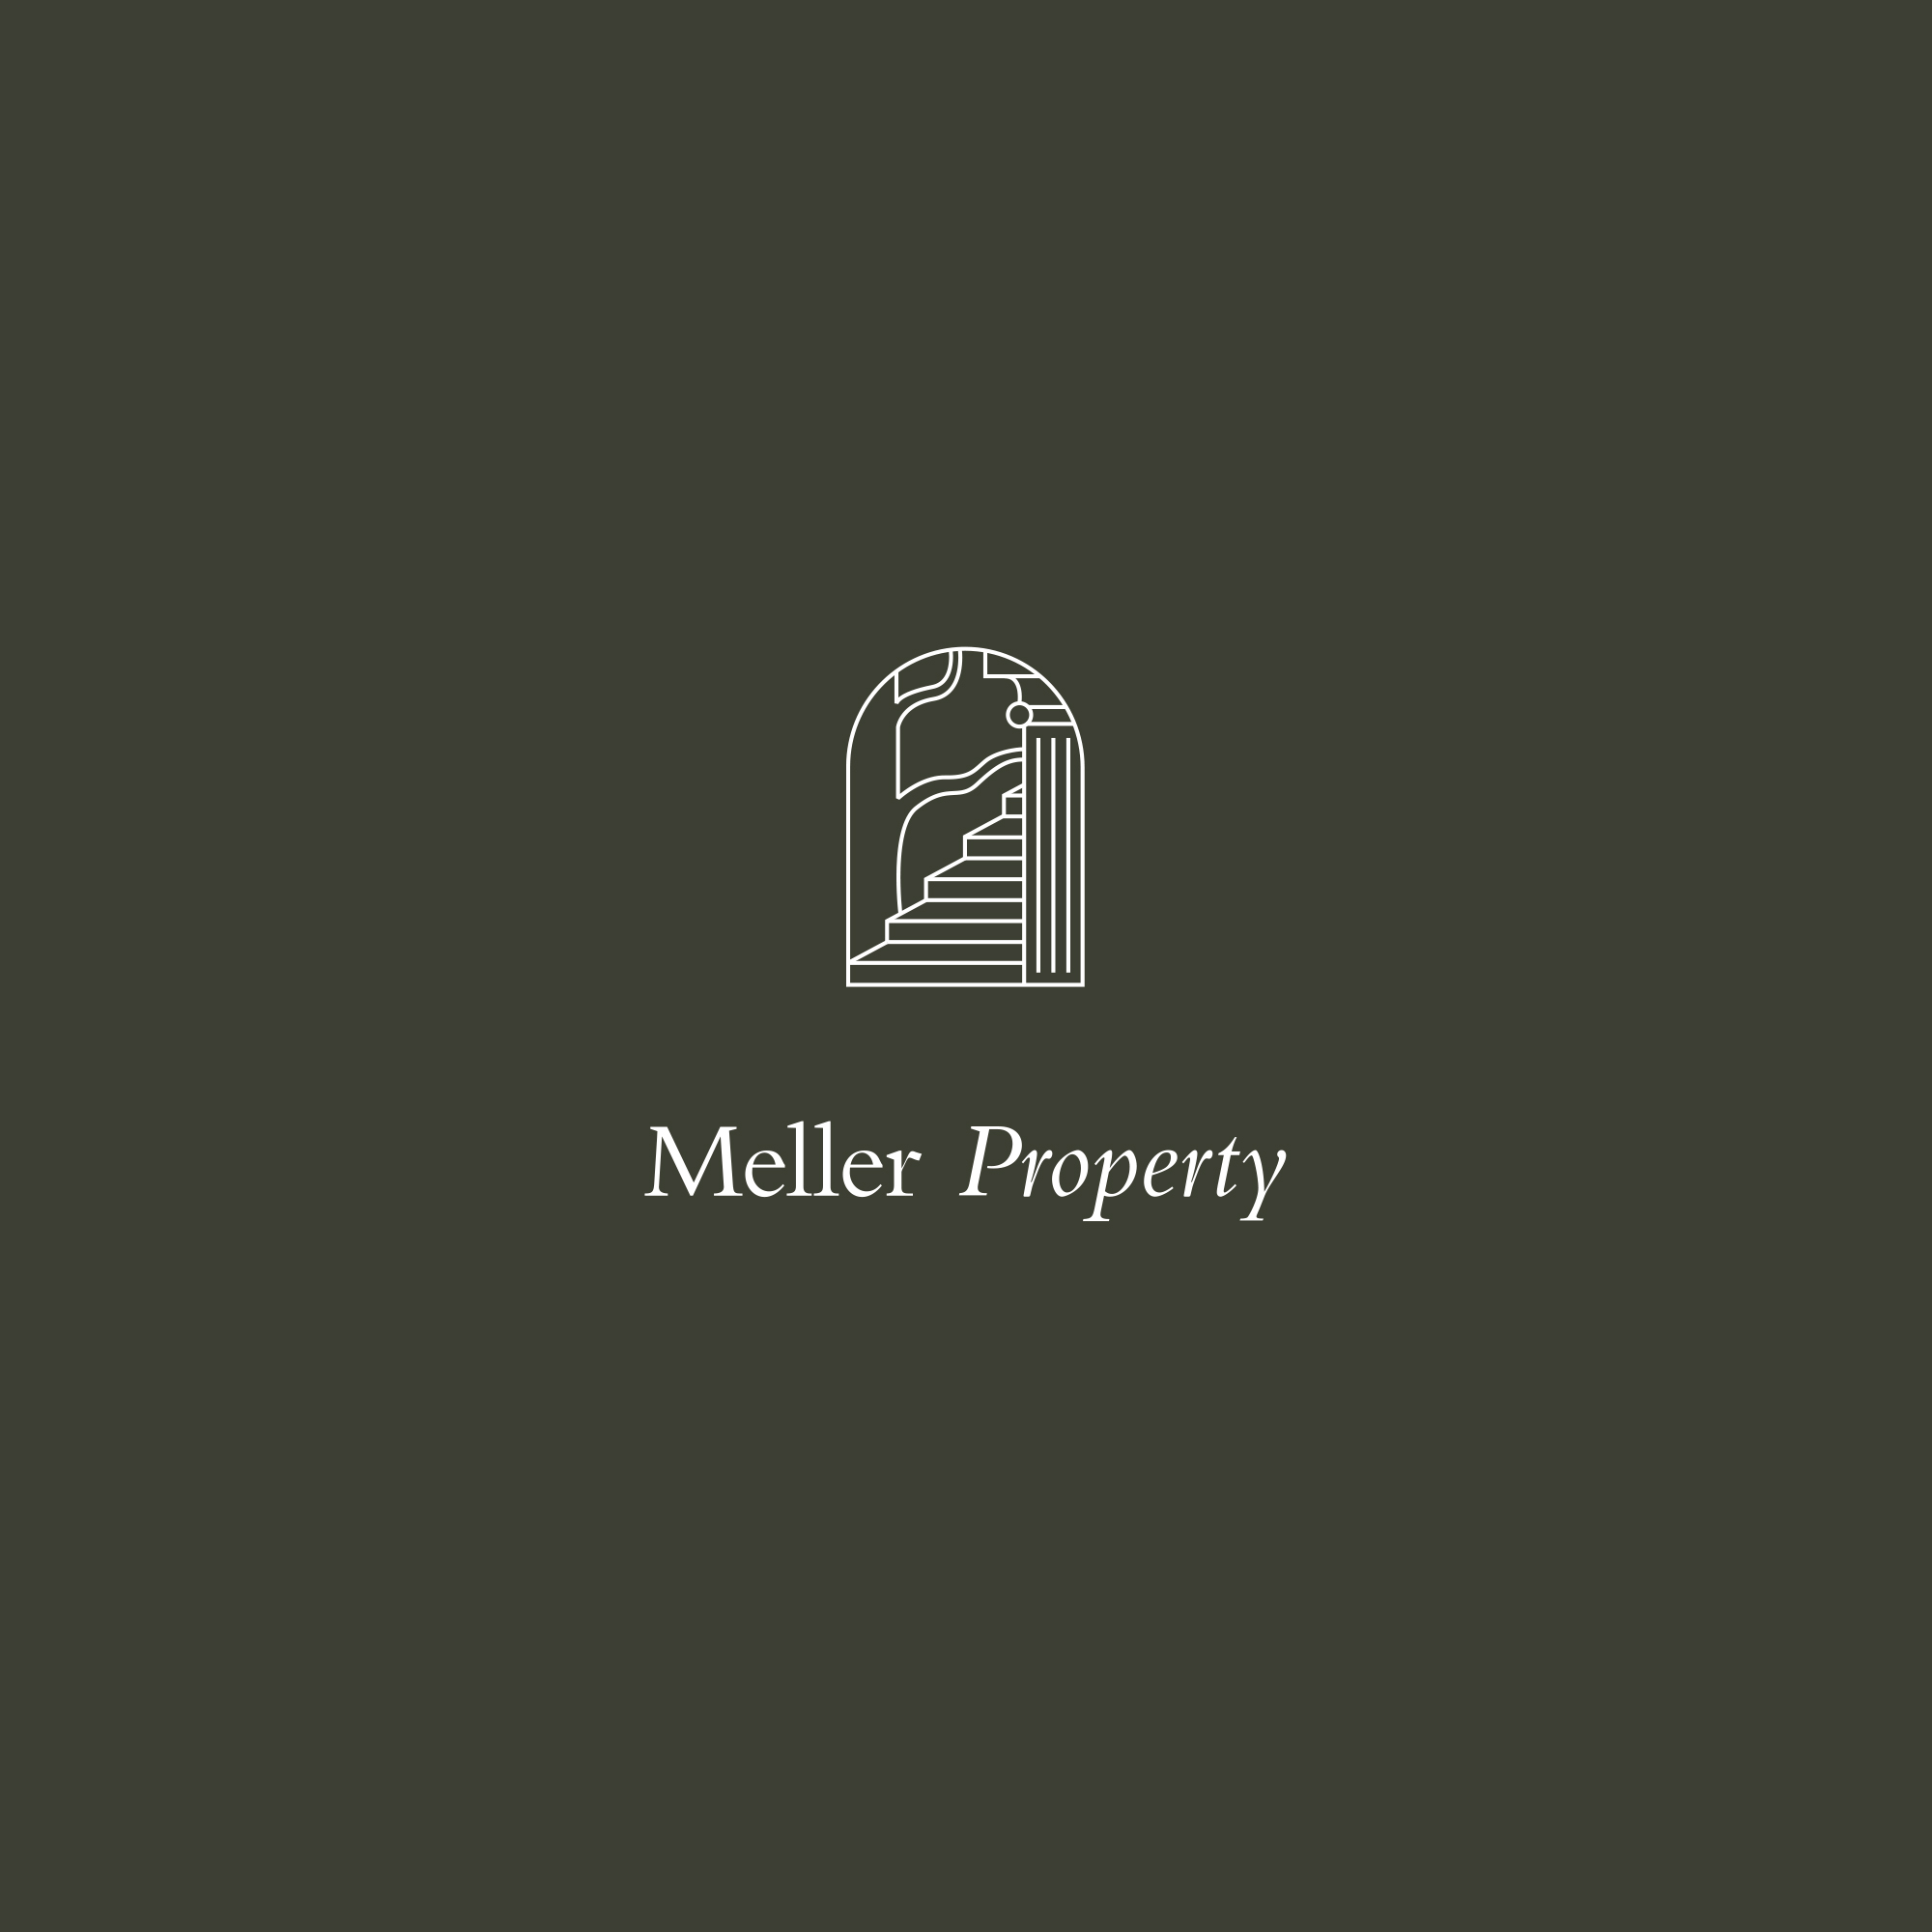 Meller Property — Branding, Strategy, Logo